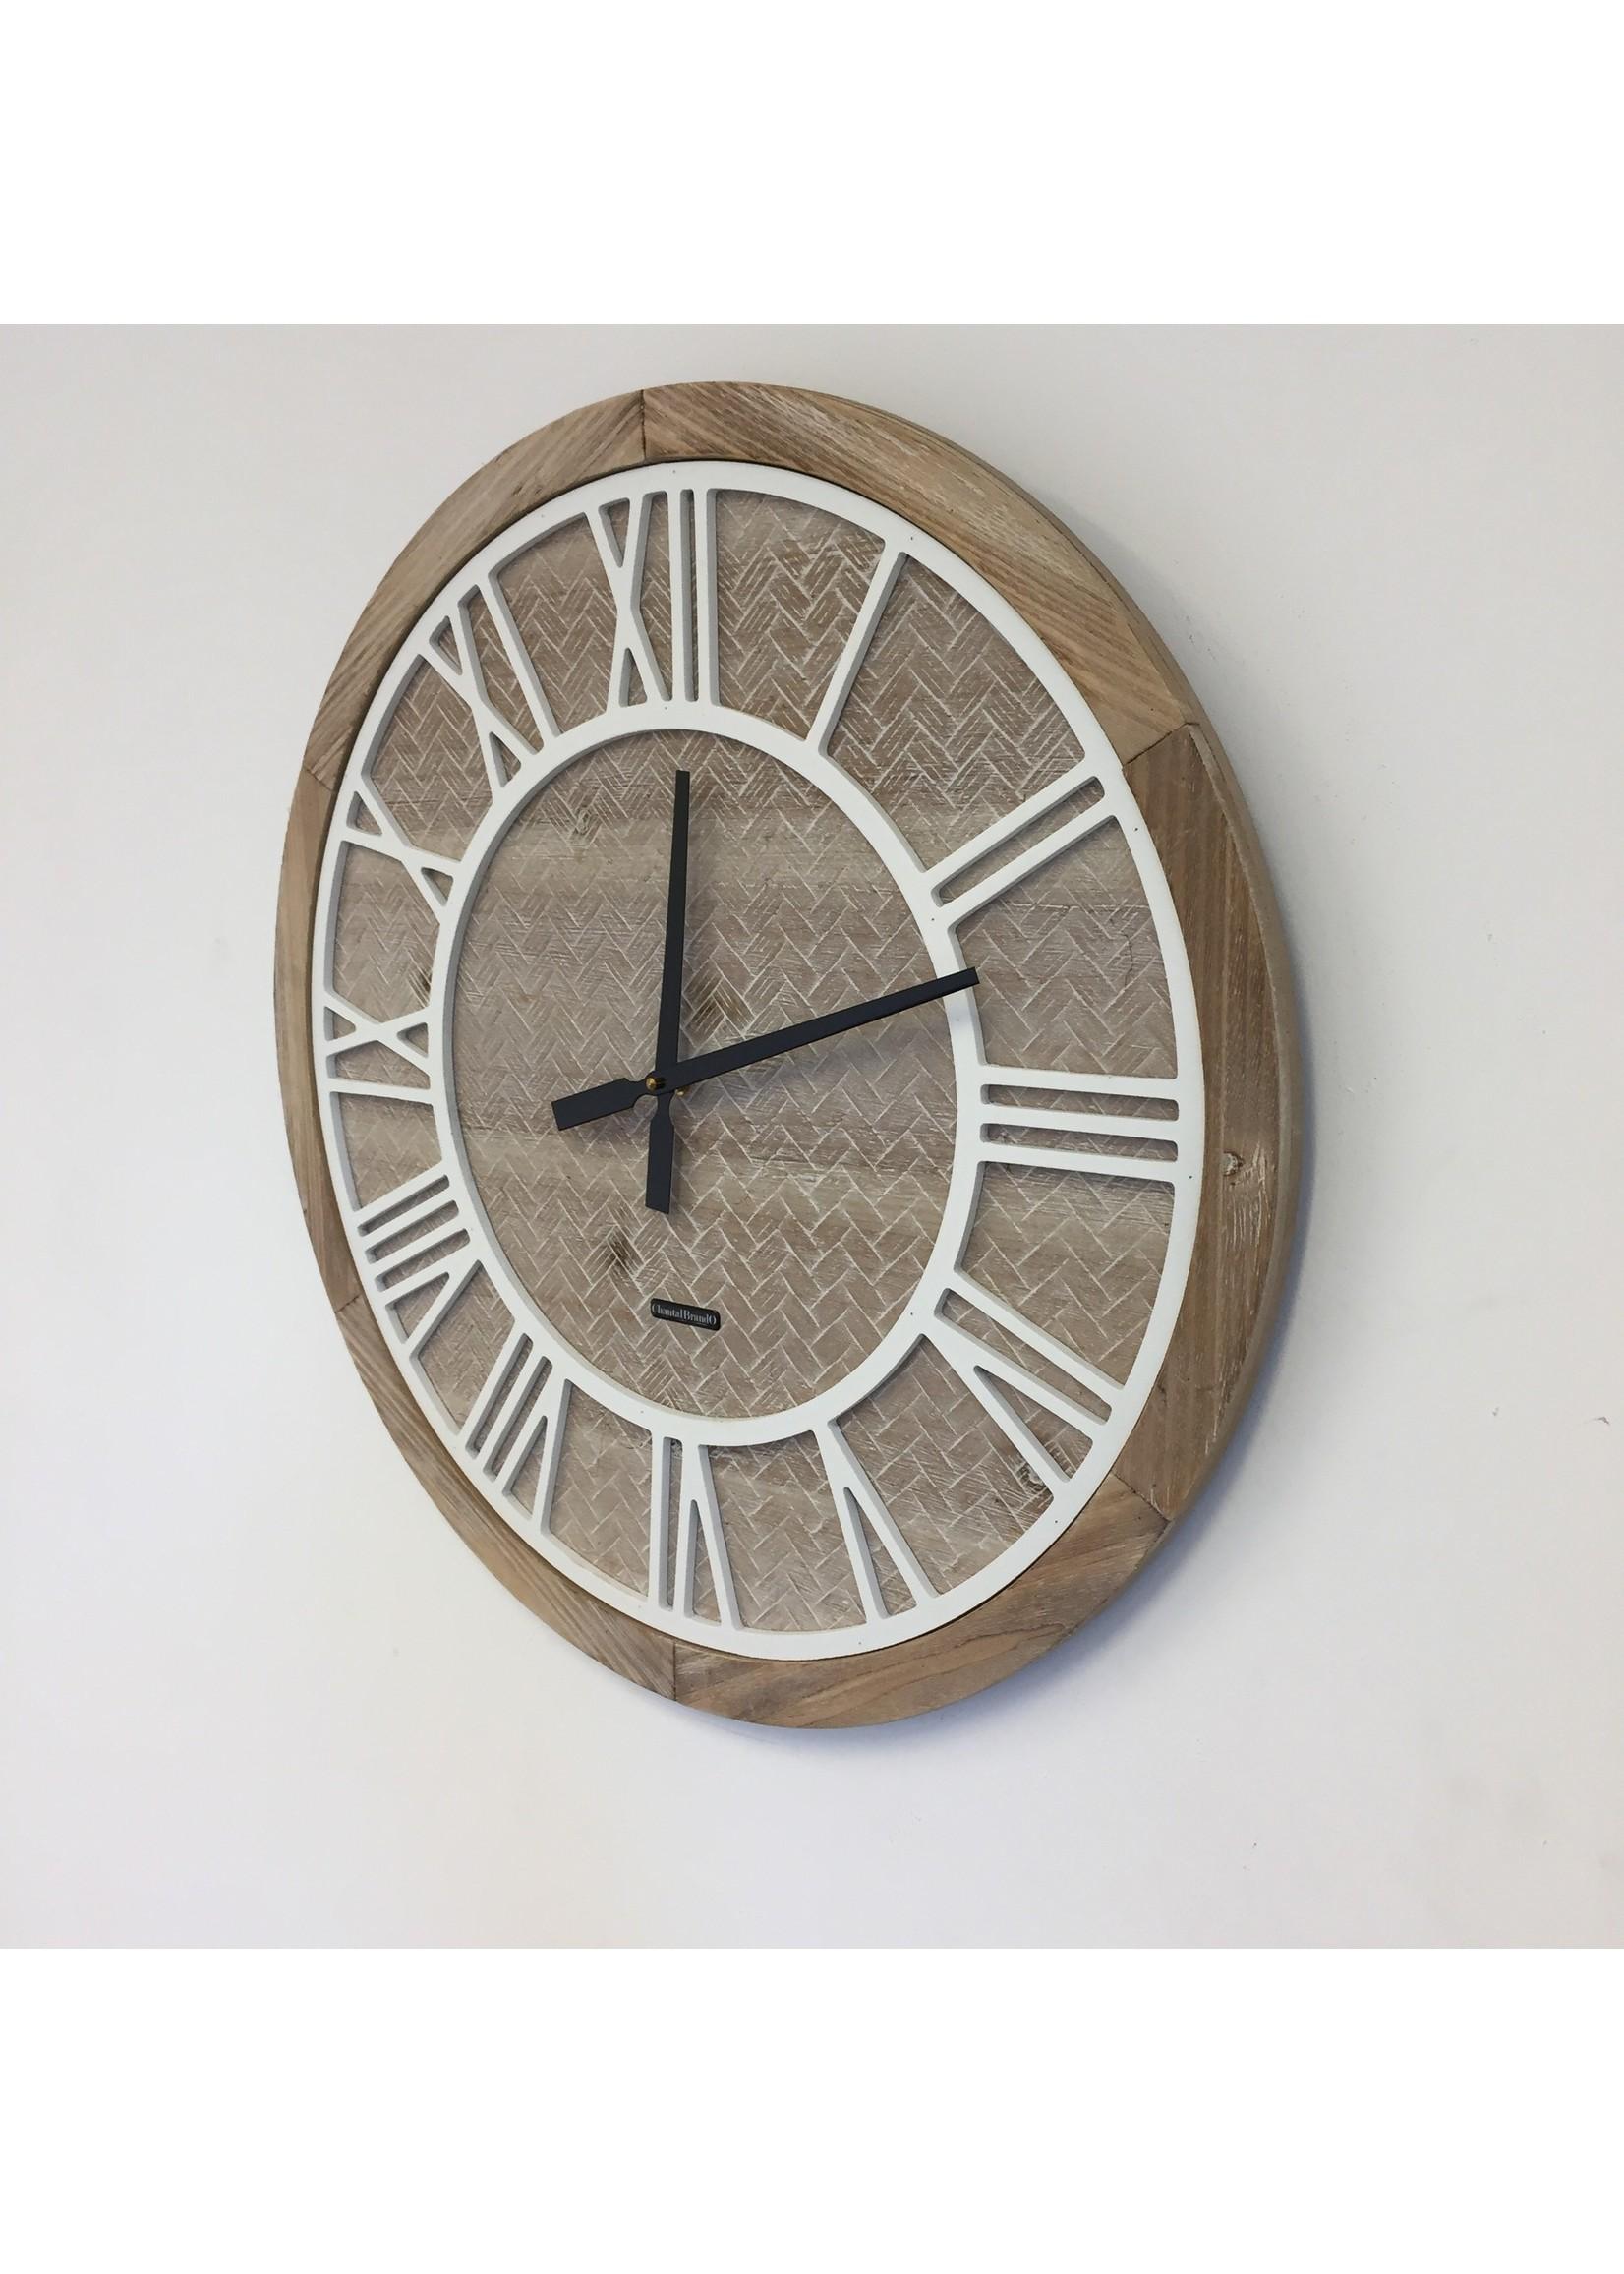 Klokkendiscounter Wandklok ROMAN WOOD modern design